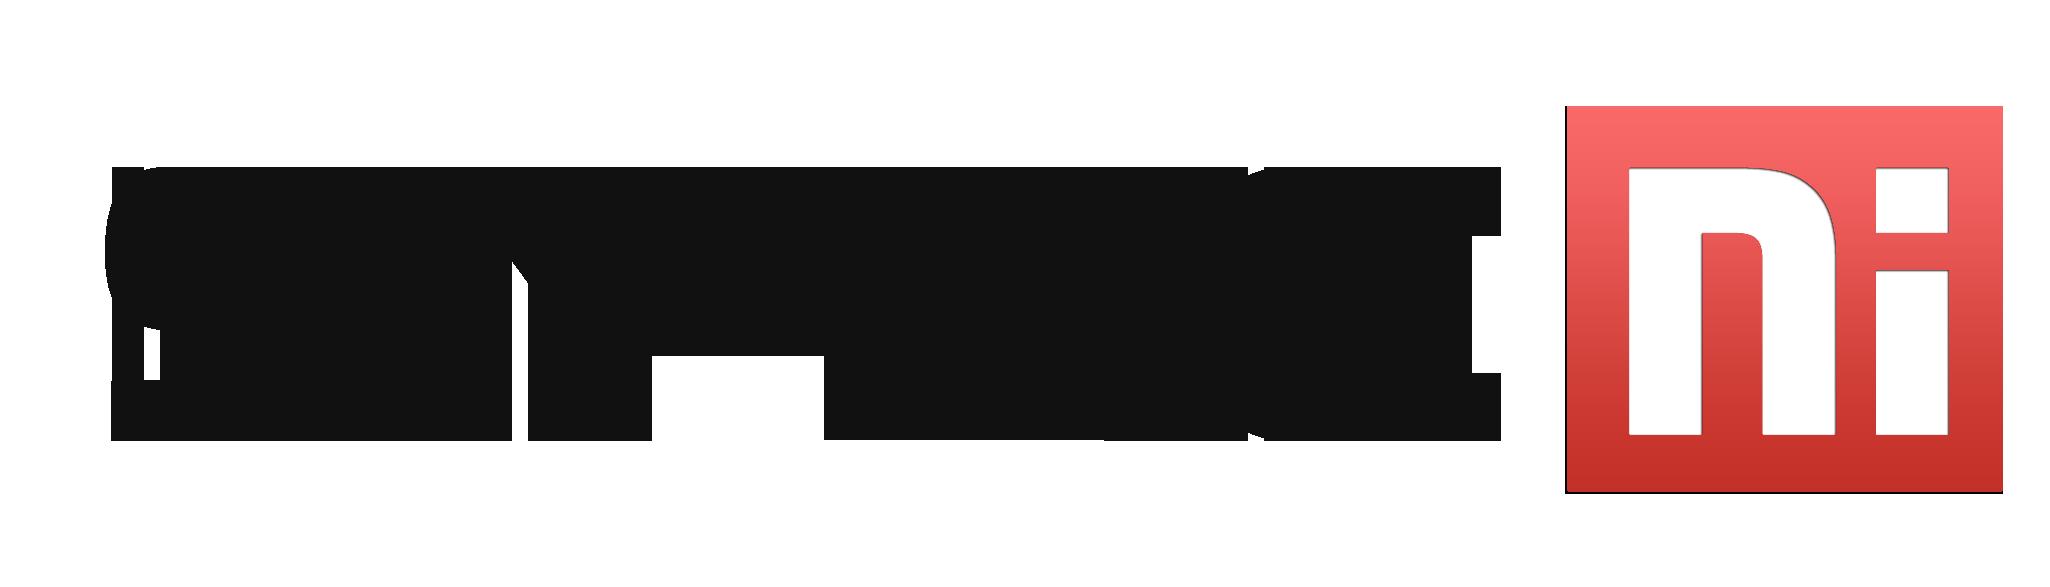 Sync NI